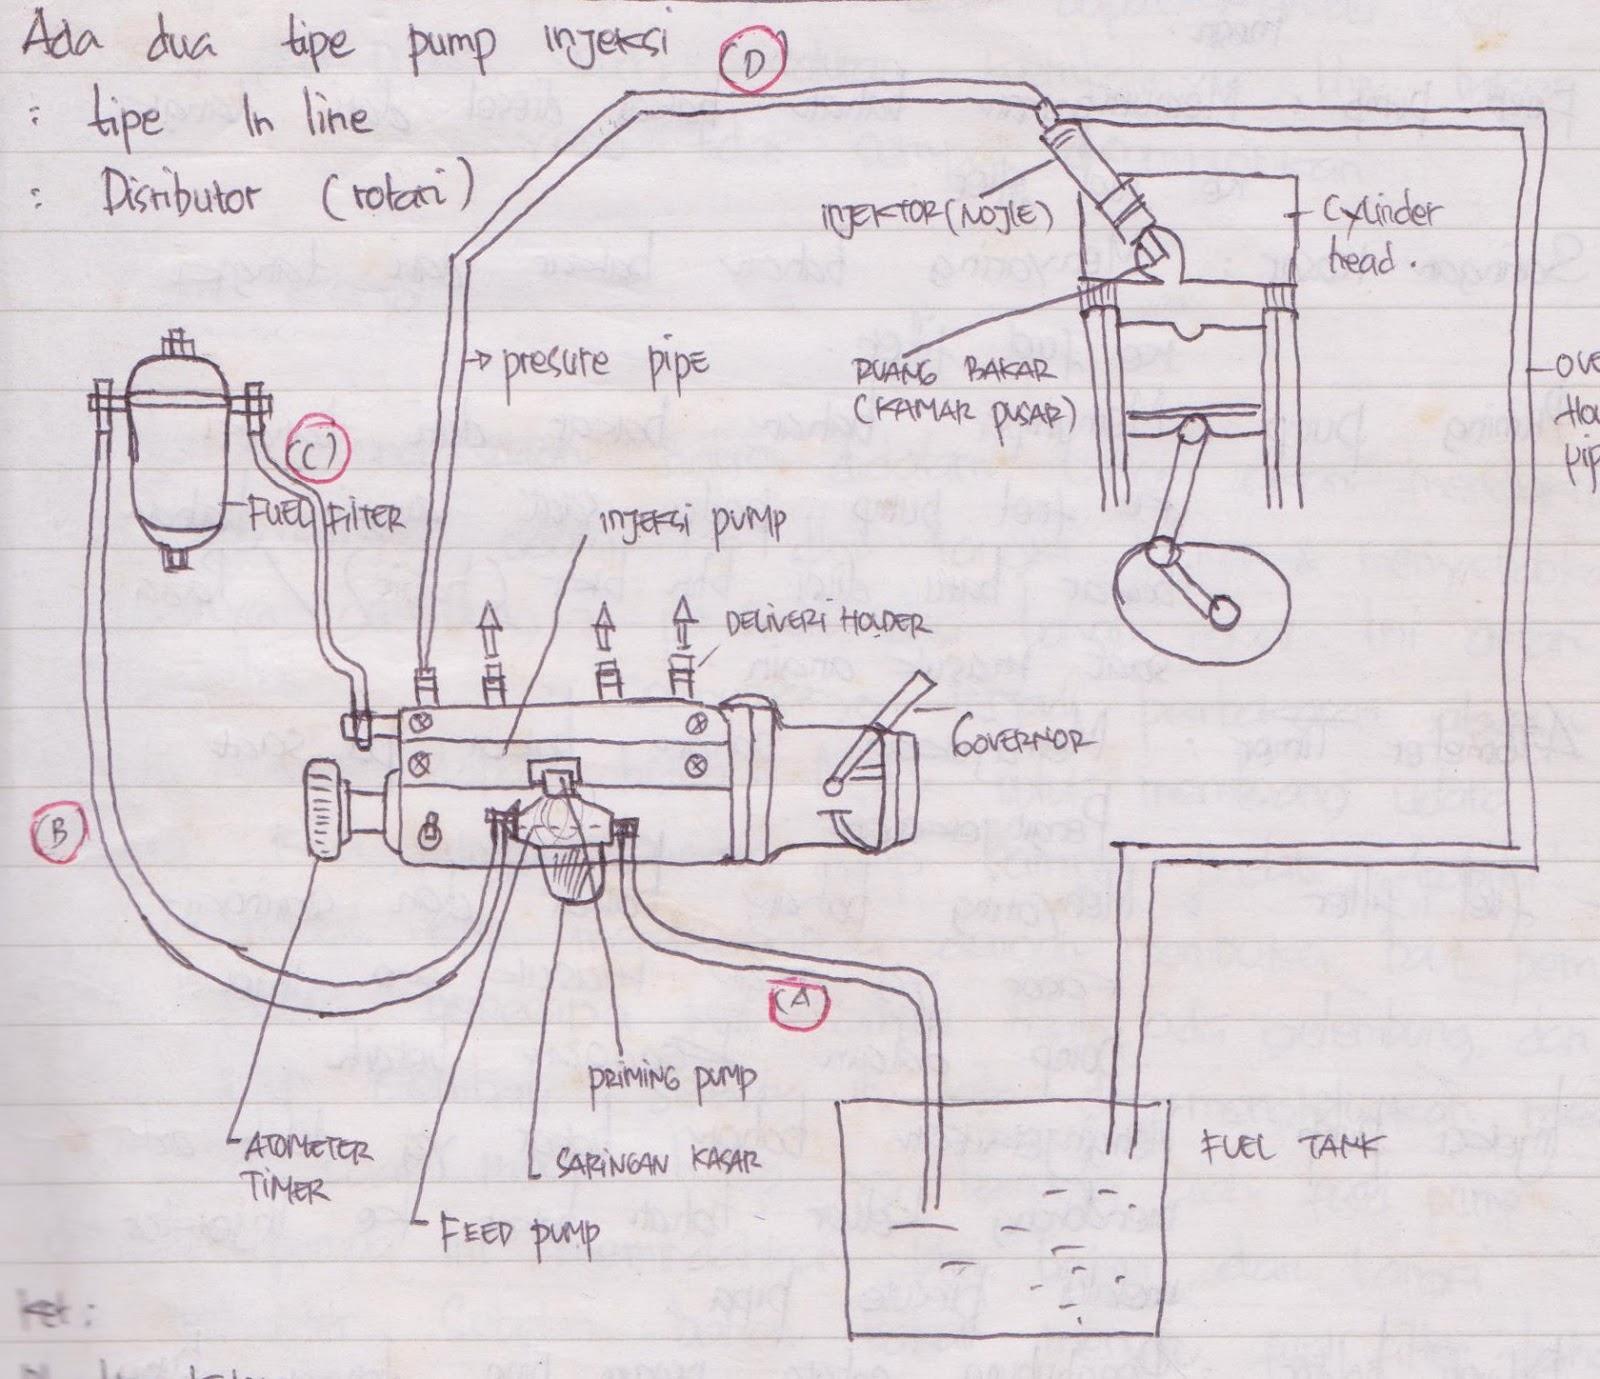 Sistem Bahan Bakar Diesel Pompa Injeksi In Line